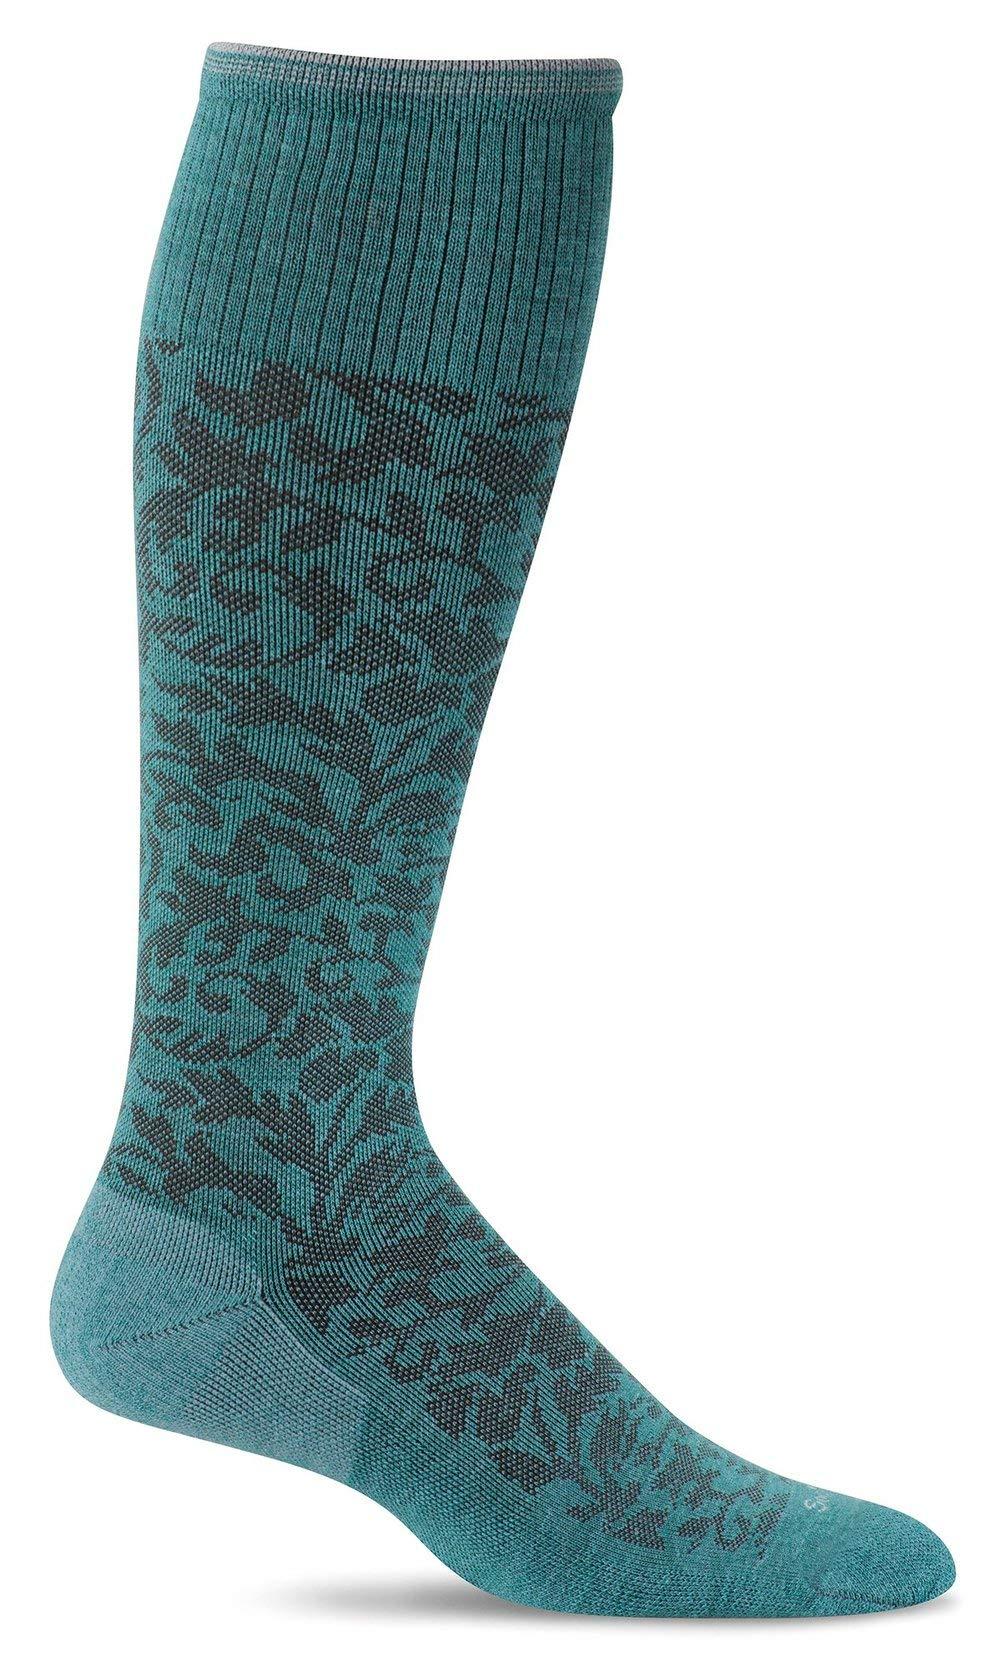 Sockwell Women's Damask Moderate Graduated Compression Socks, Mineral, Small/Medium